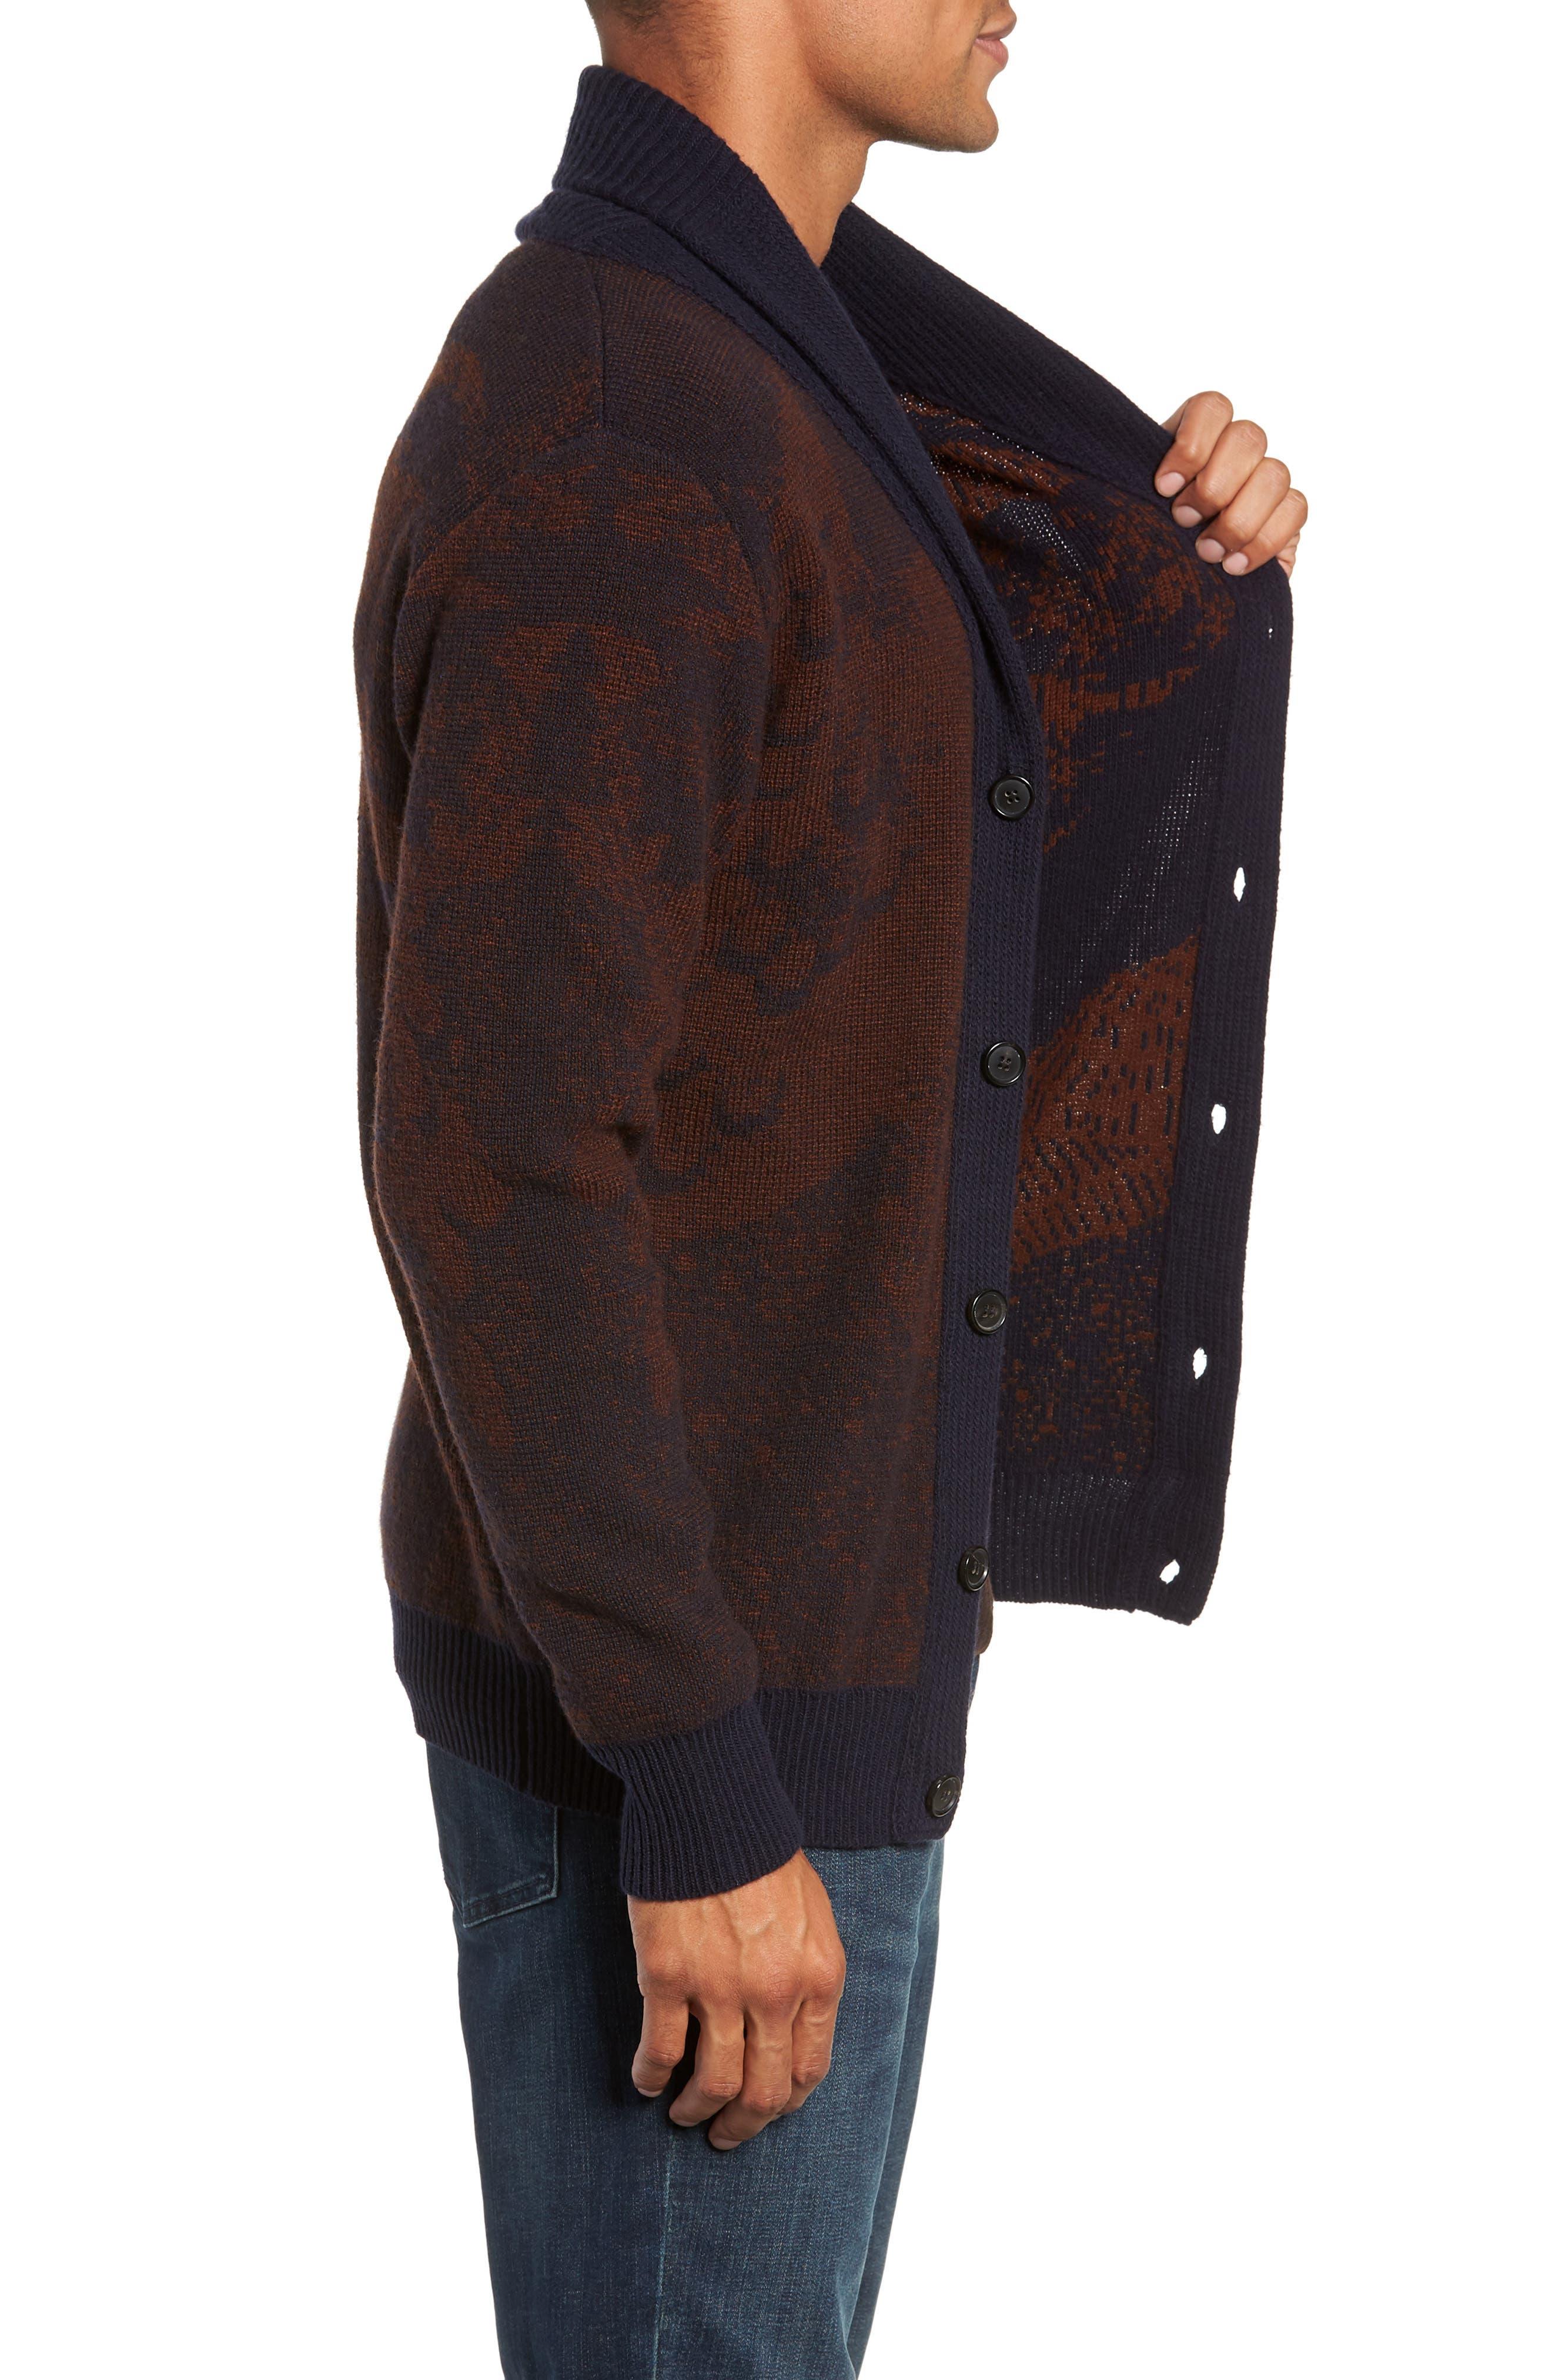 Peacock Shawl Collar Wool Blend Cardigan,                             Alternate thumbnail 3, color,                             NAVY/ RUST